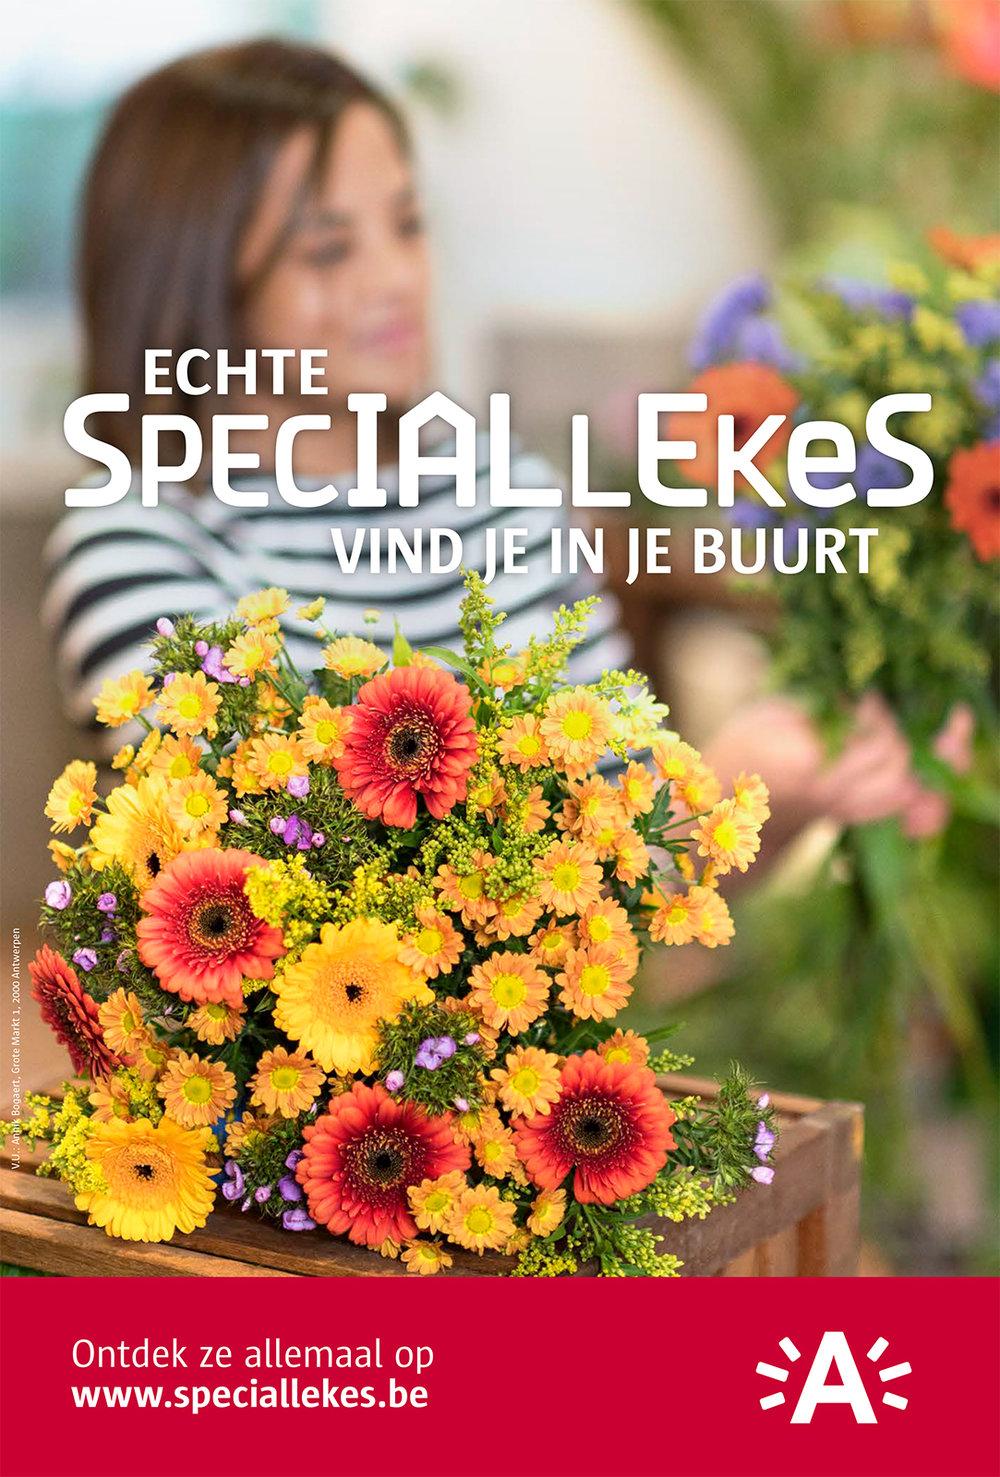 stad_buurtwinkel_abribus_350x237_nl_5-3.jpg